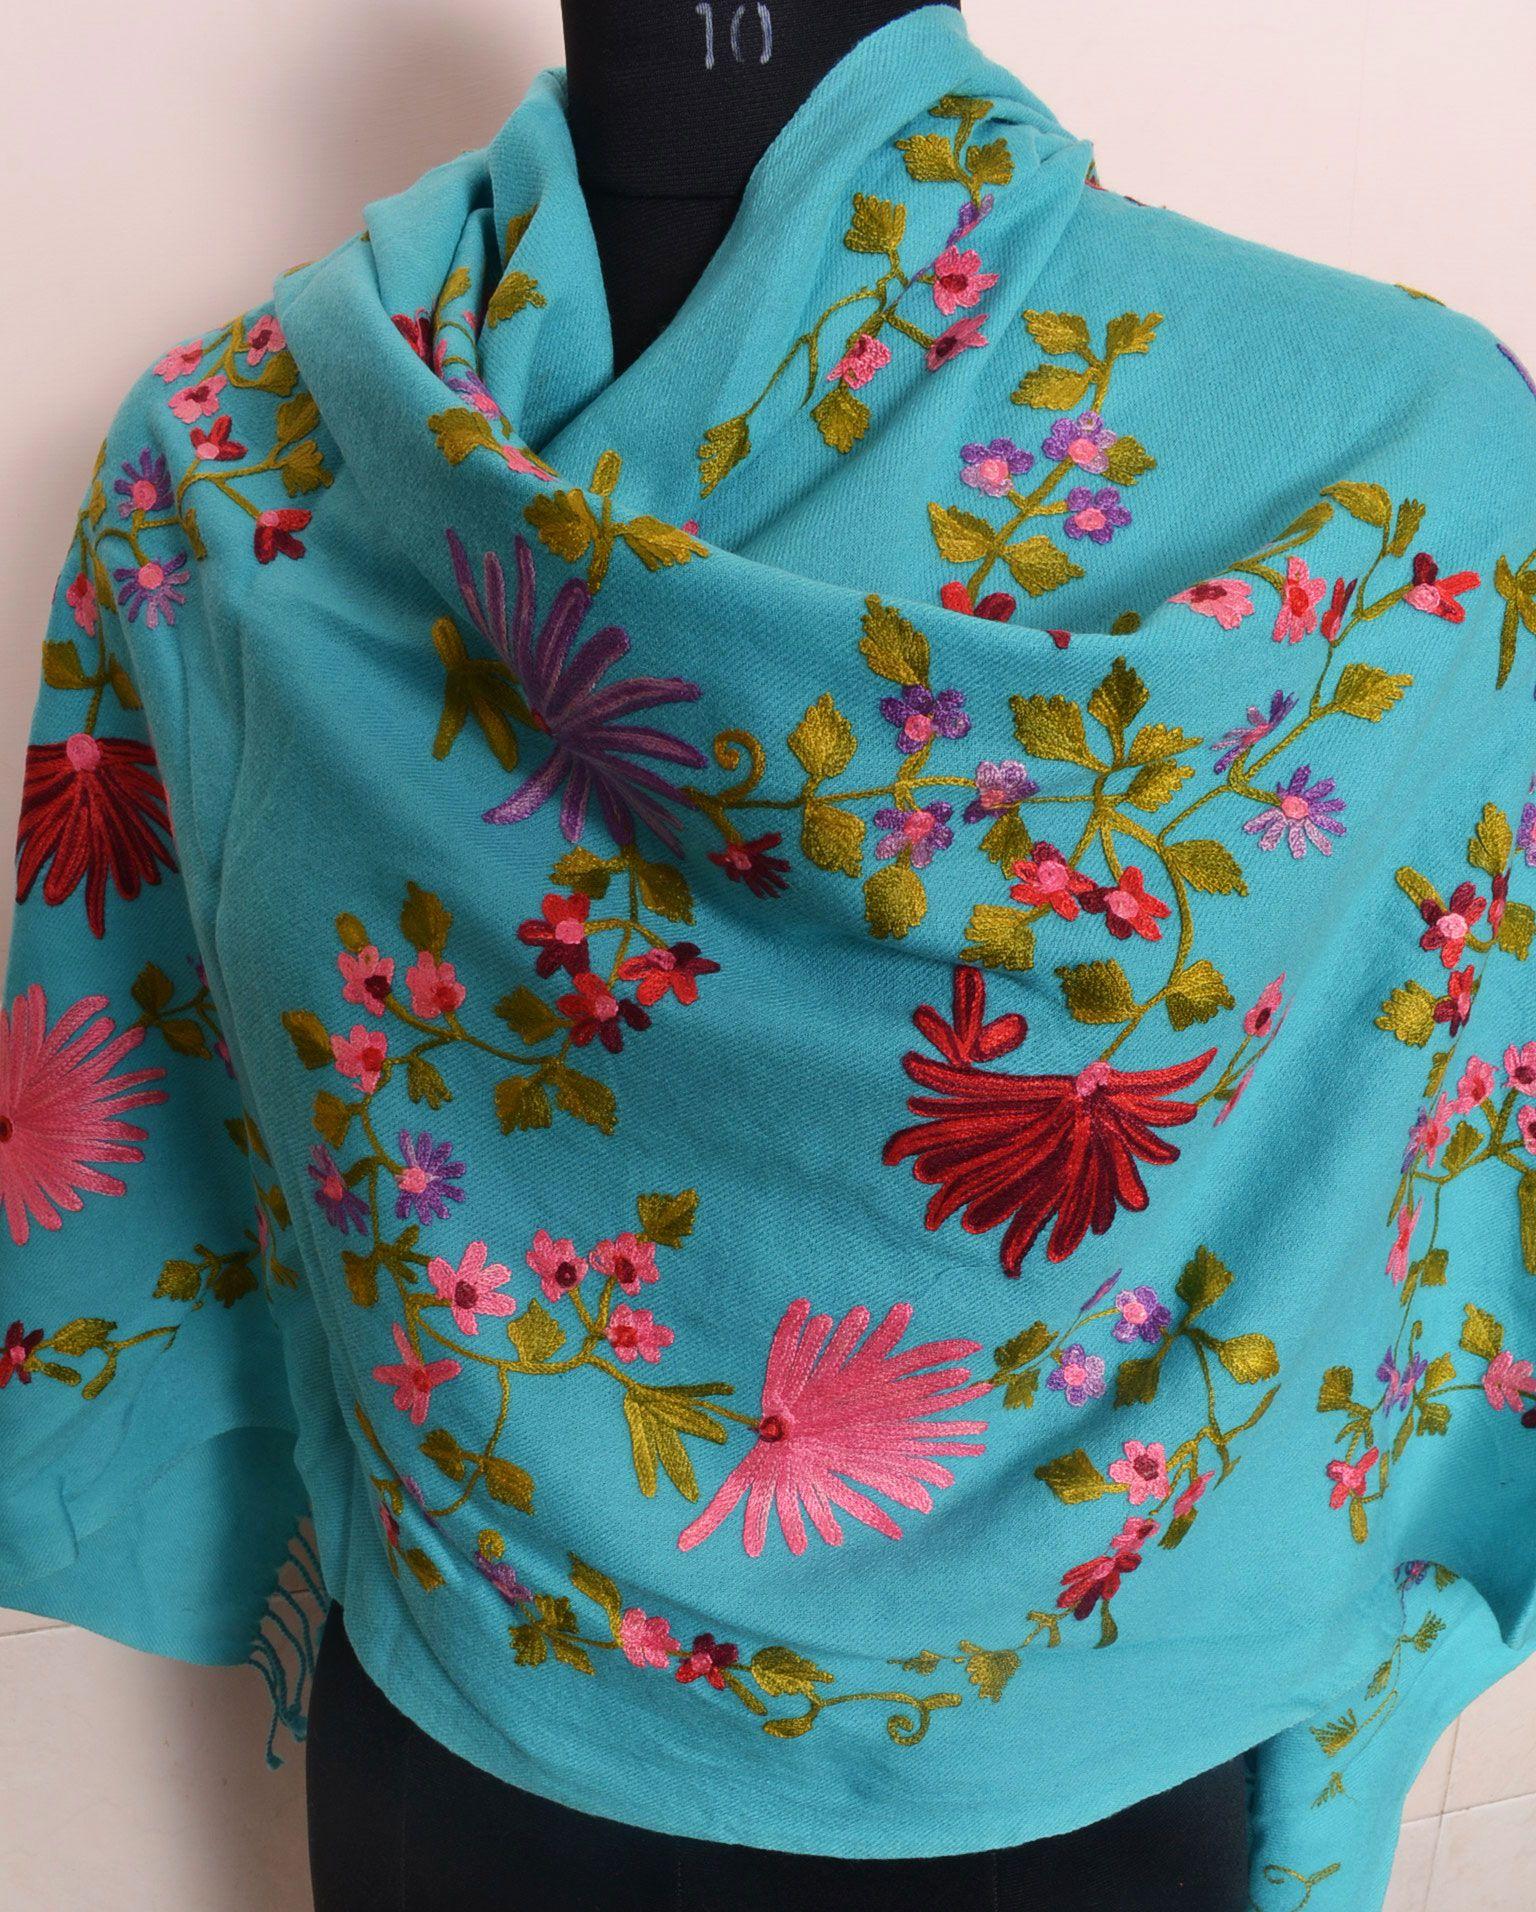 Kashmiri Embroidered Cashmere Shawl Cashmere Shawl Hemp Clothing Hemp Bag